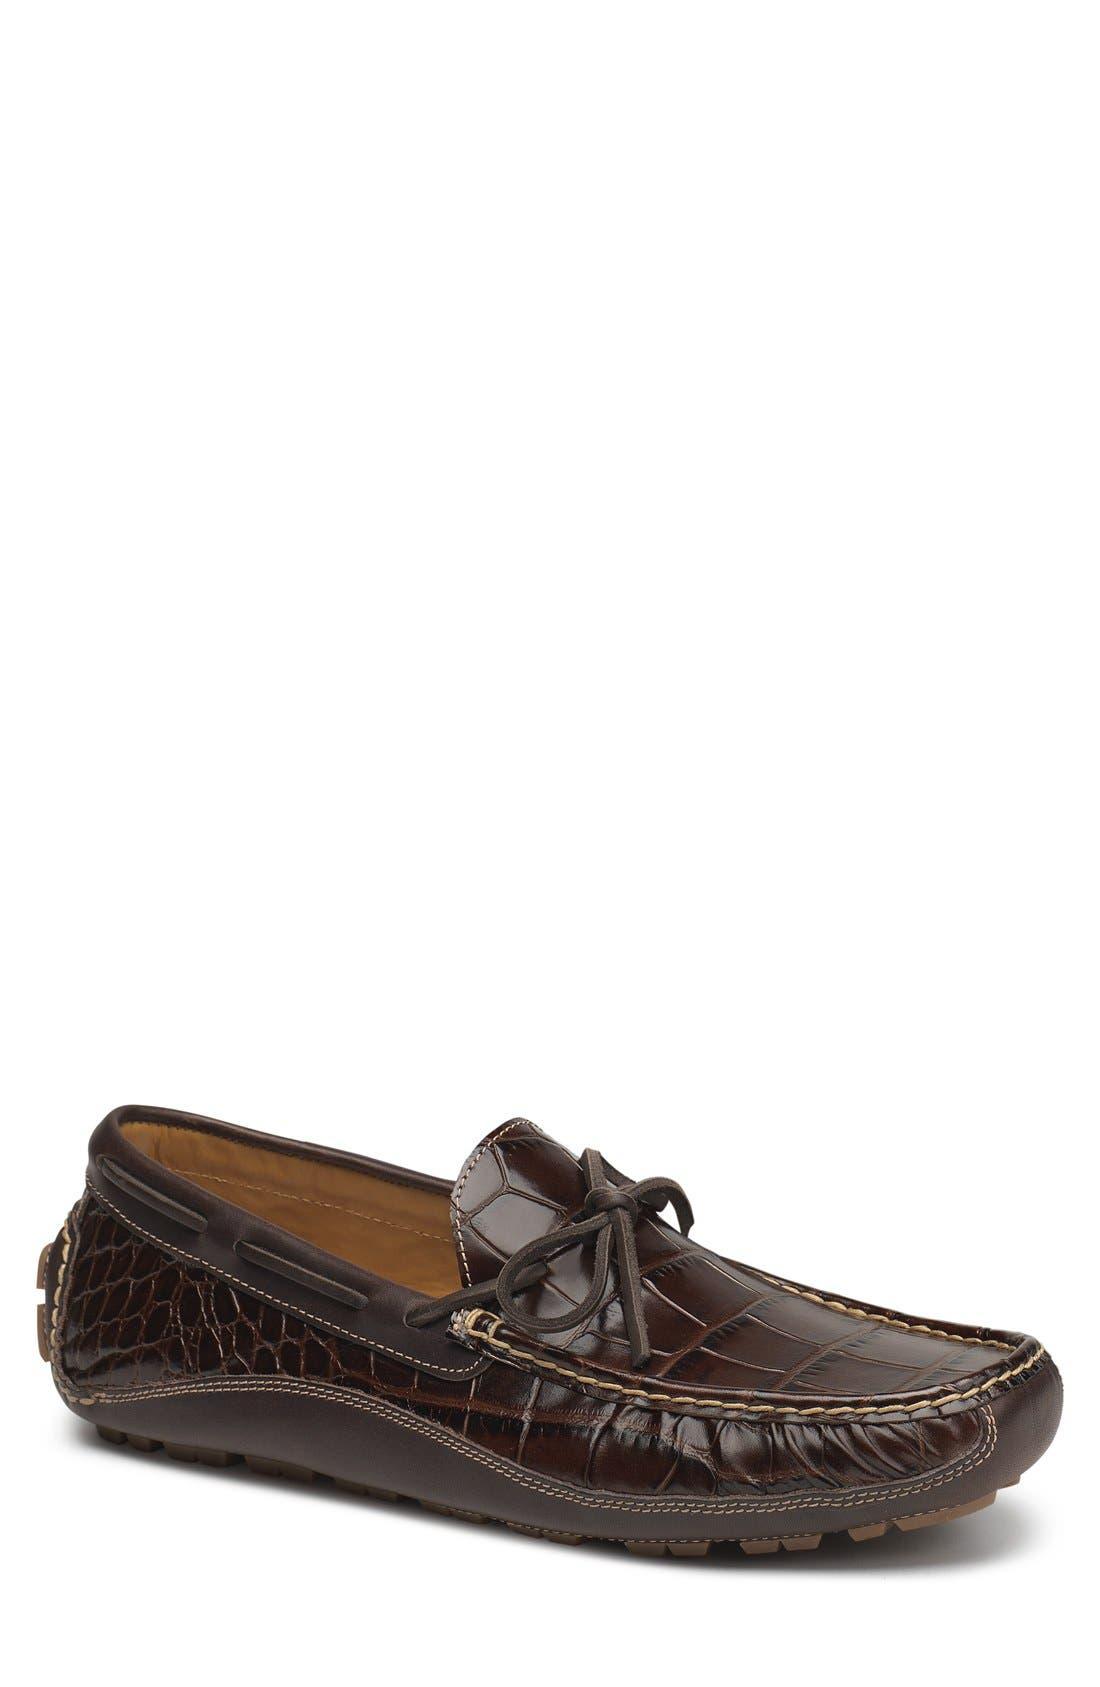 'Drake' Leather Driving Shoe,                             Main thumbnail 3, color,